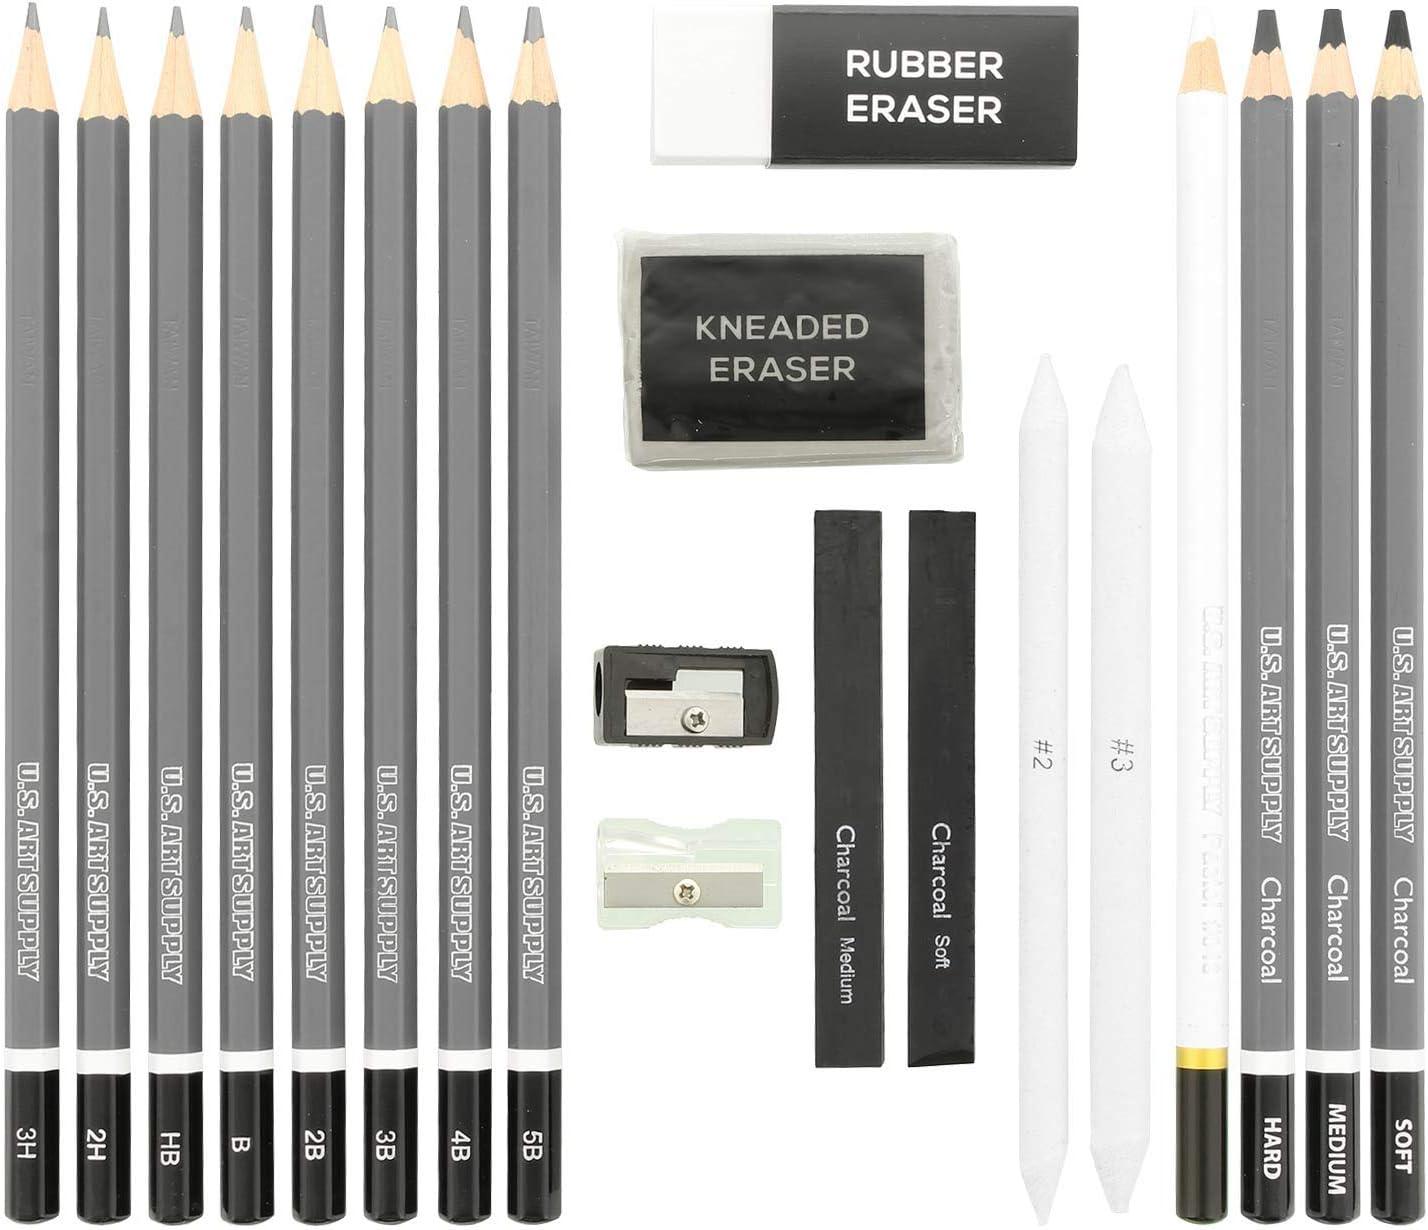 Pastel Bonus Pack of 2-5.5 x 8.5 Sketch Pads Sketch /& Charcoal Pencils Eraser Stumps Sharpeners U.S Art Supply 20 Piece Professional Hi-Quality Artist Sketch Set in Hard Storage Case